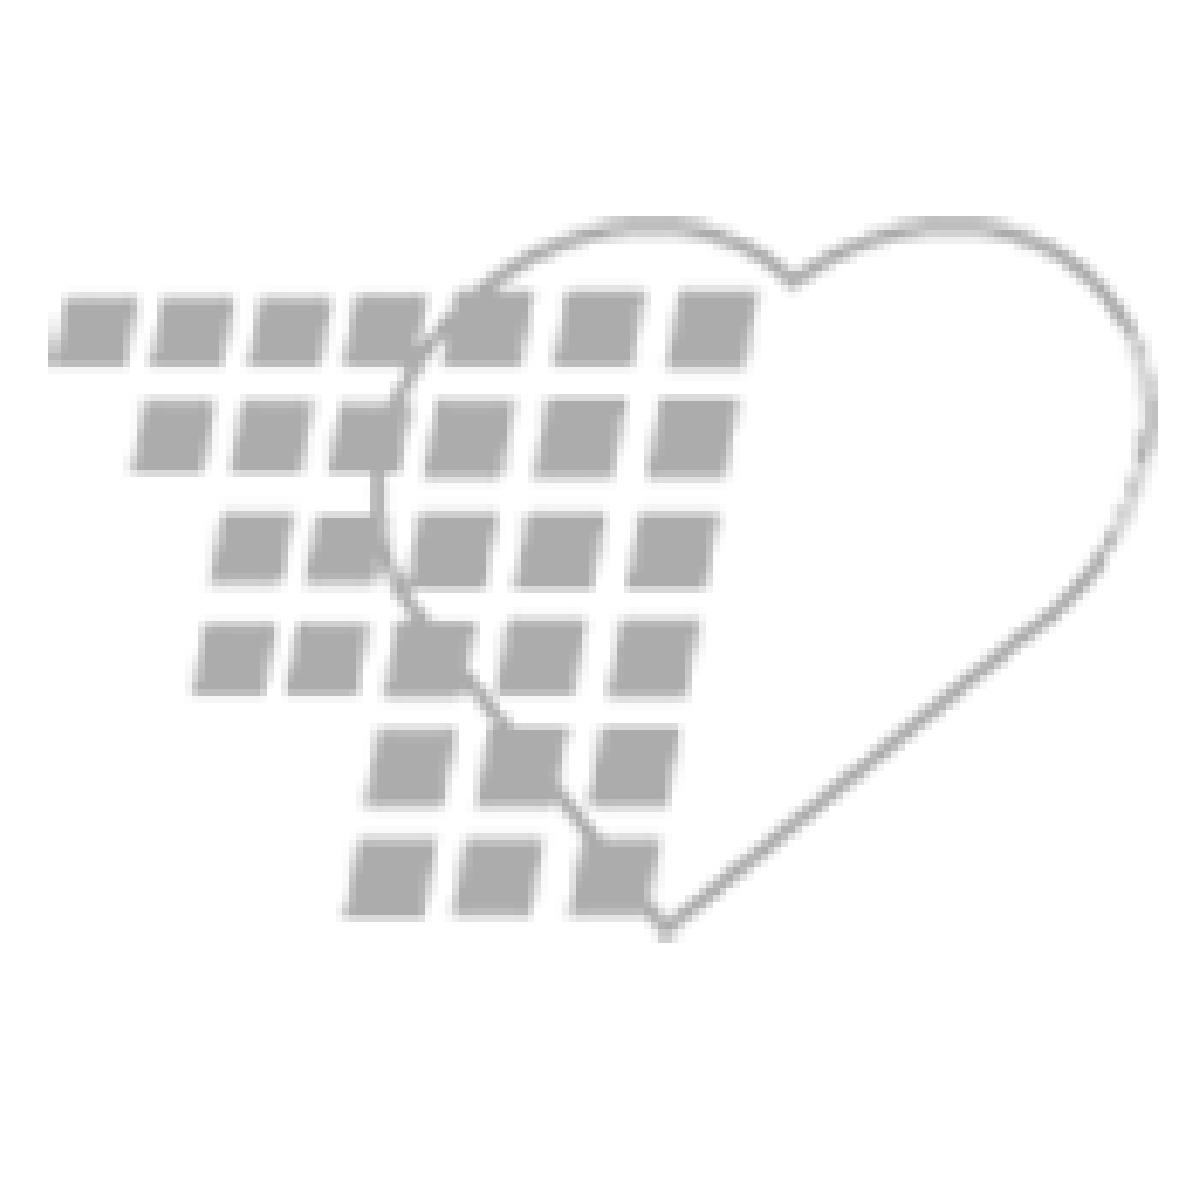 04-25-8211 Unit Dose Medication Cart